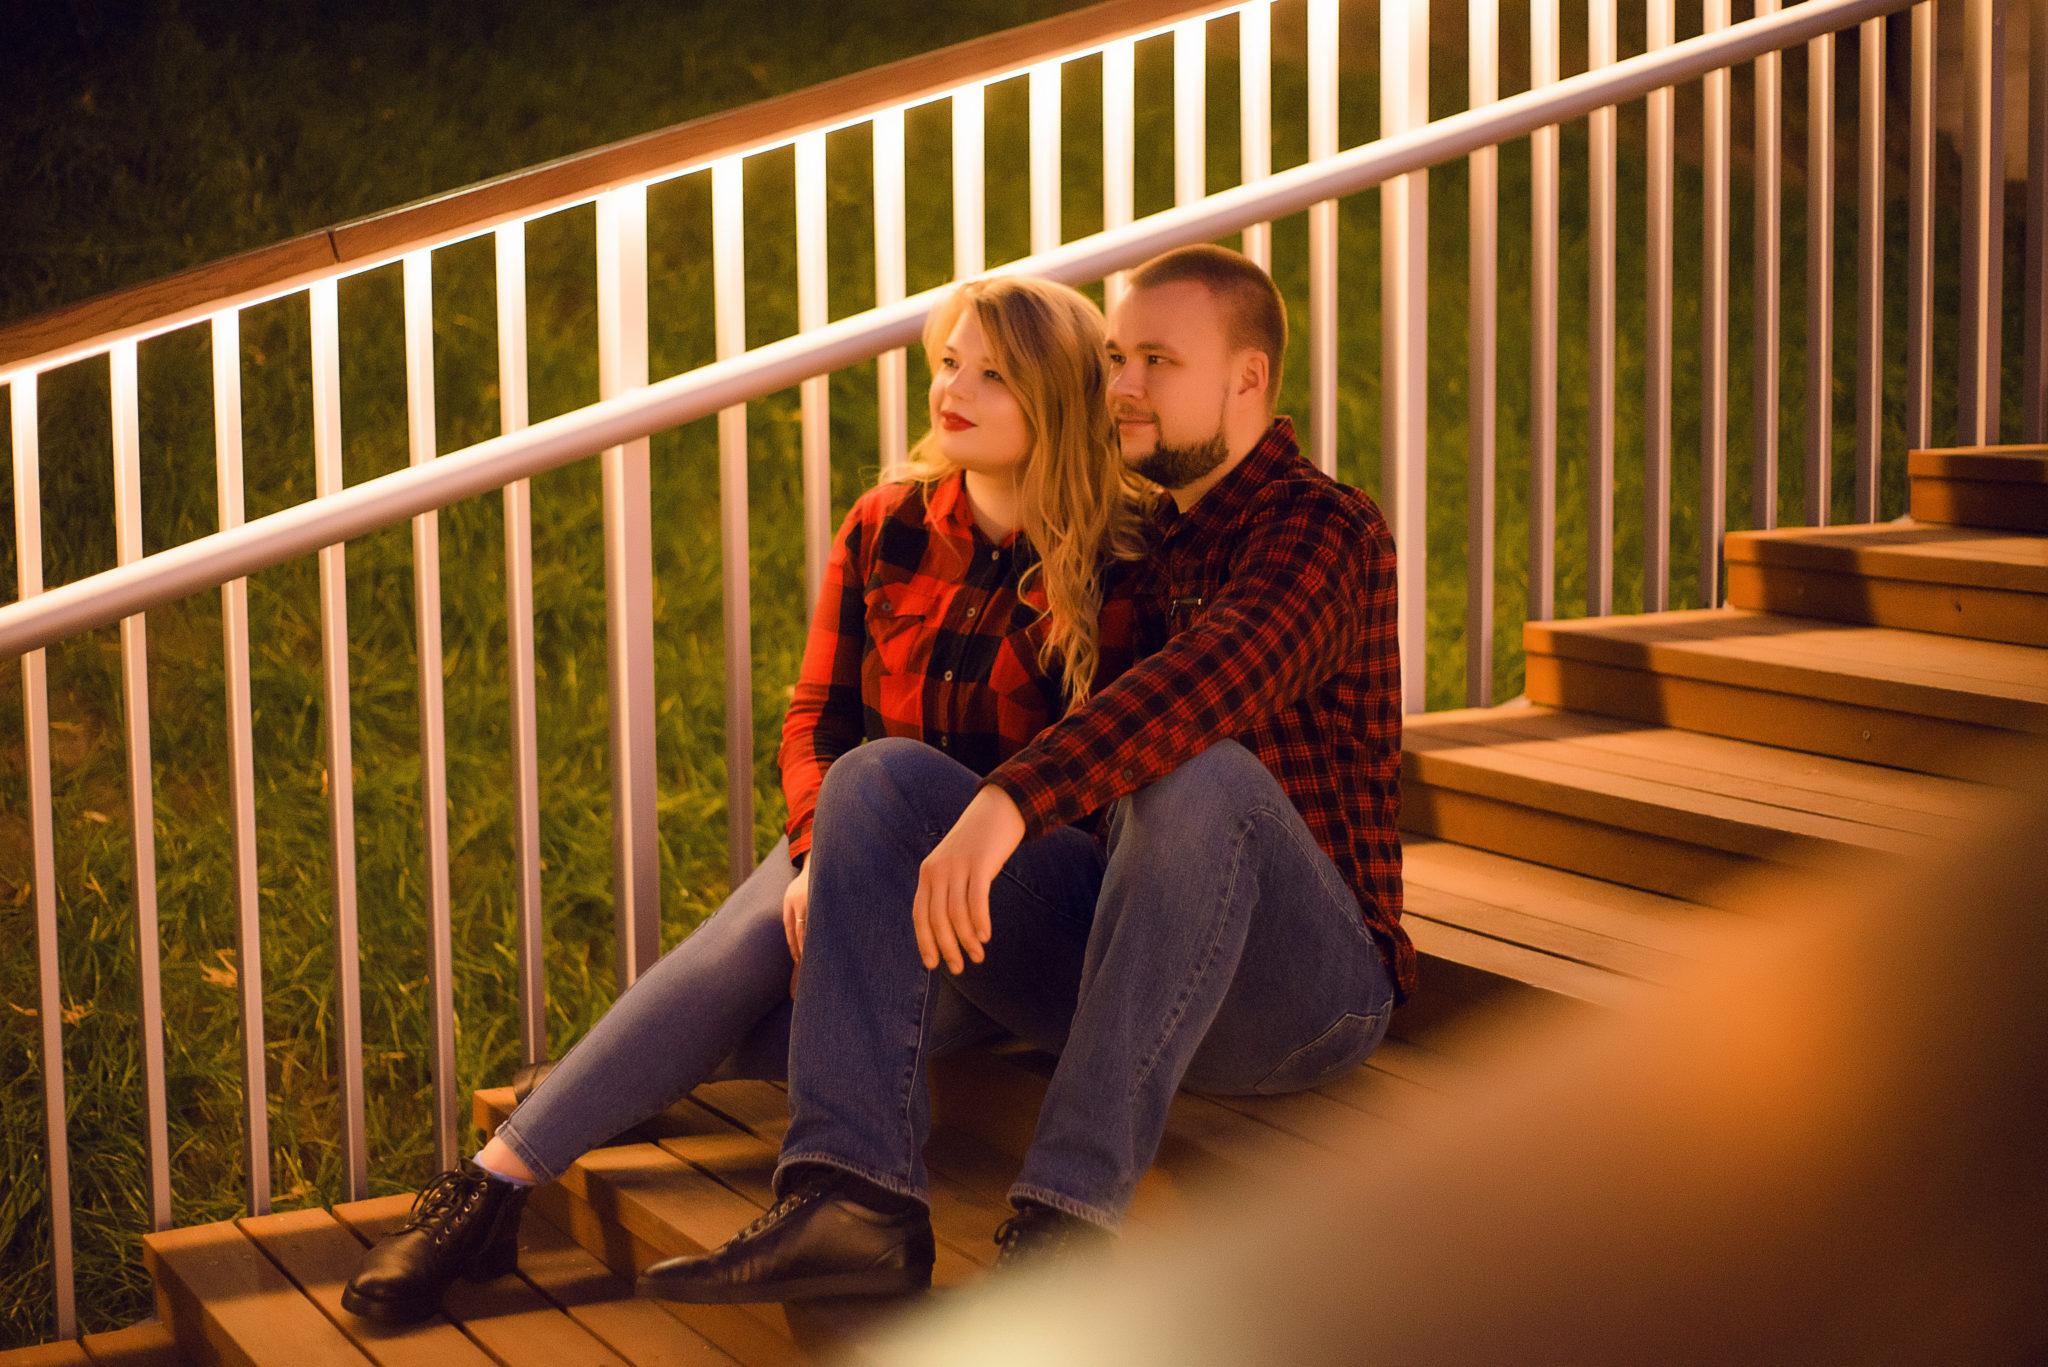 Love Story на природе, локация Подол, пара сидит на деревянных ступеньках, ph Постникова Алиса